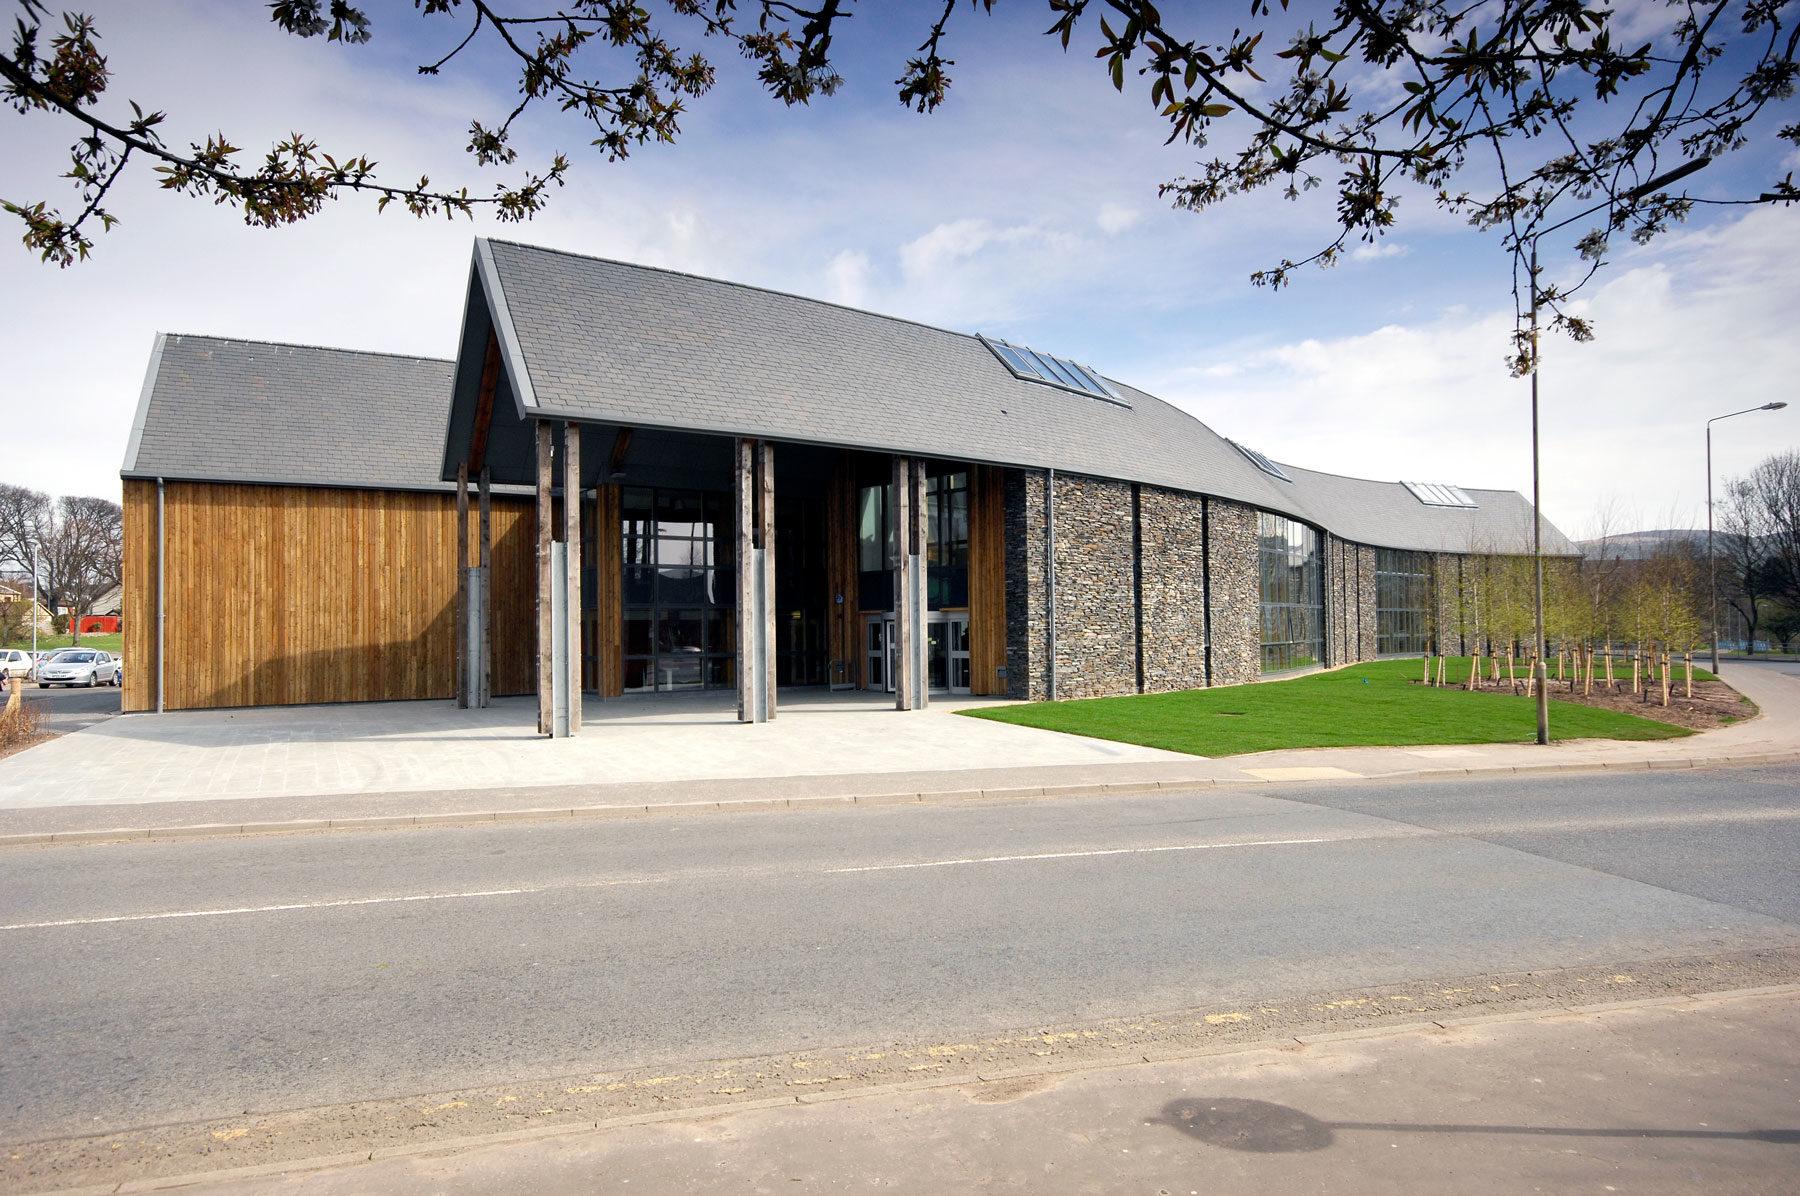 Loch Lomond & Trossachs National Park Headquarters